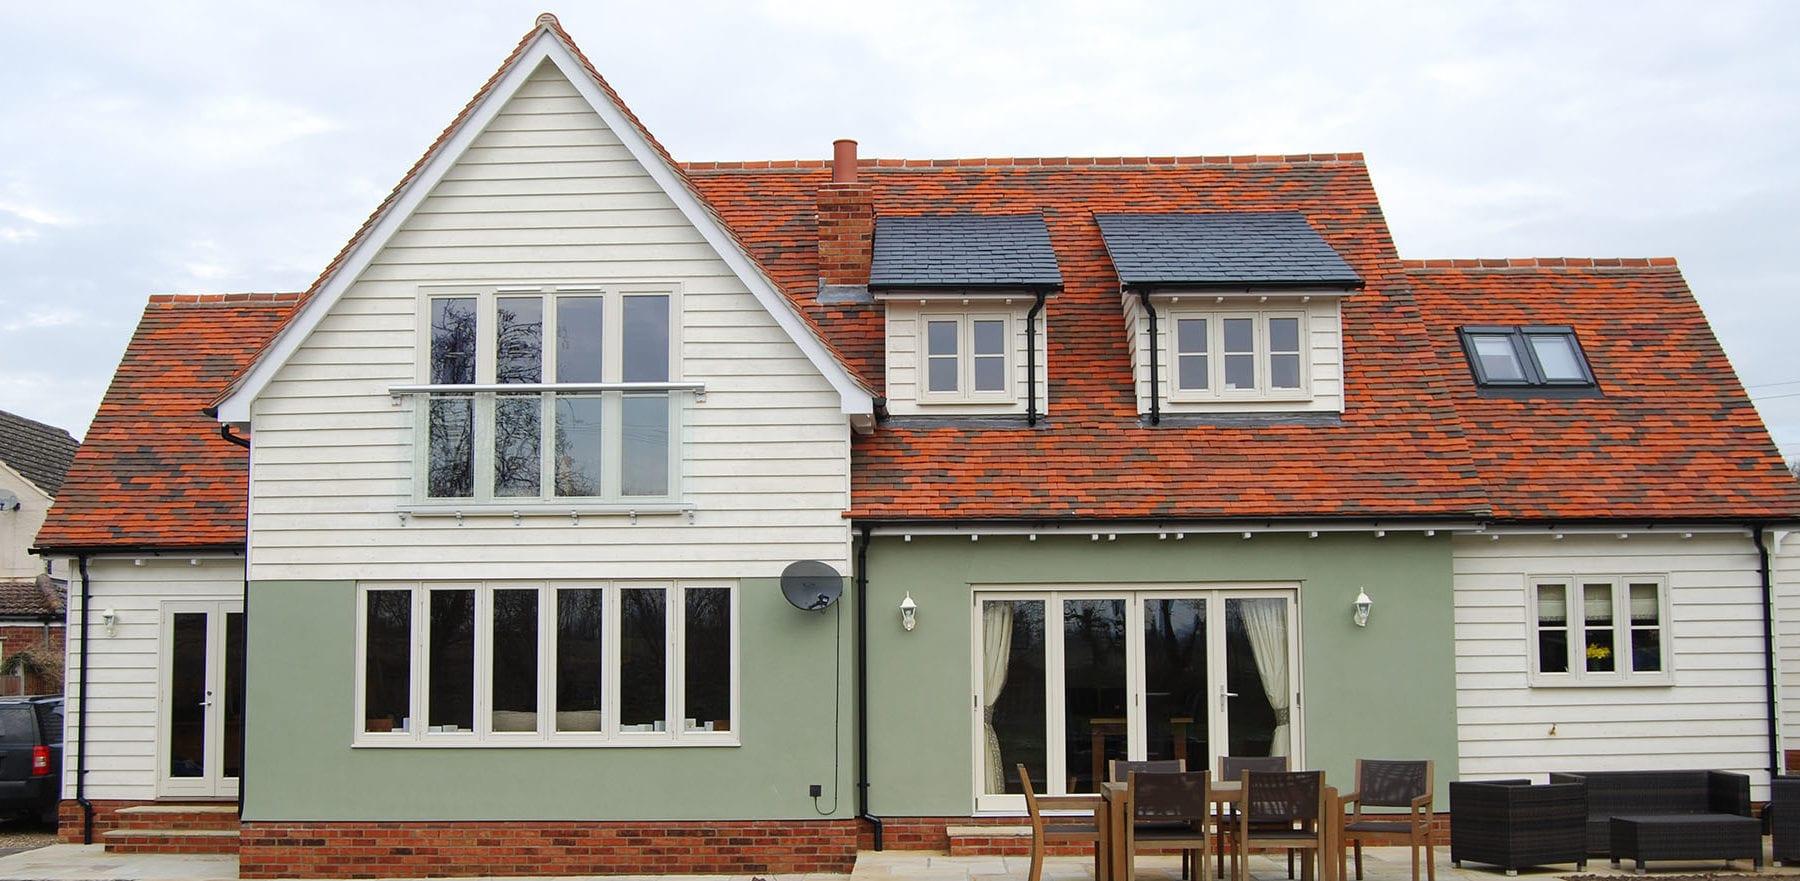 Lifestiles - Handcrafted Tilehurst Clay Roof Tiles - Cranbourne, England 5